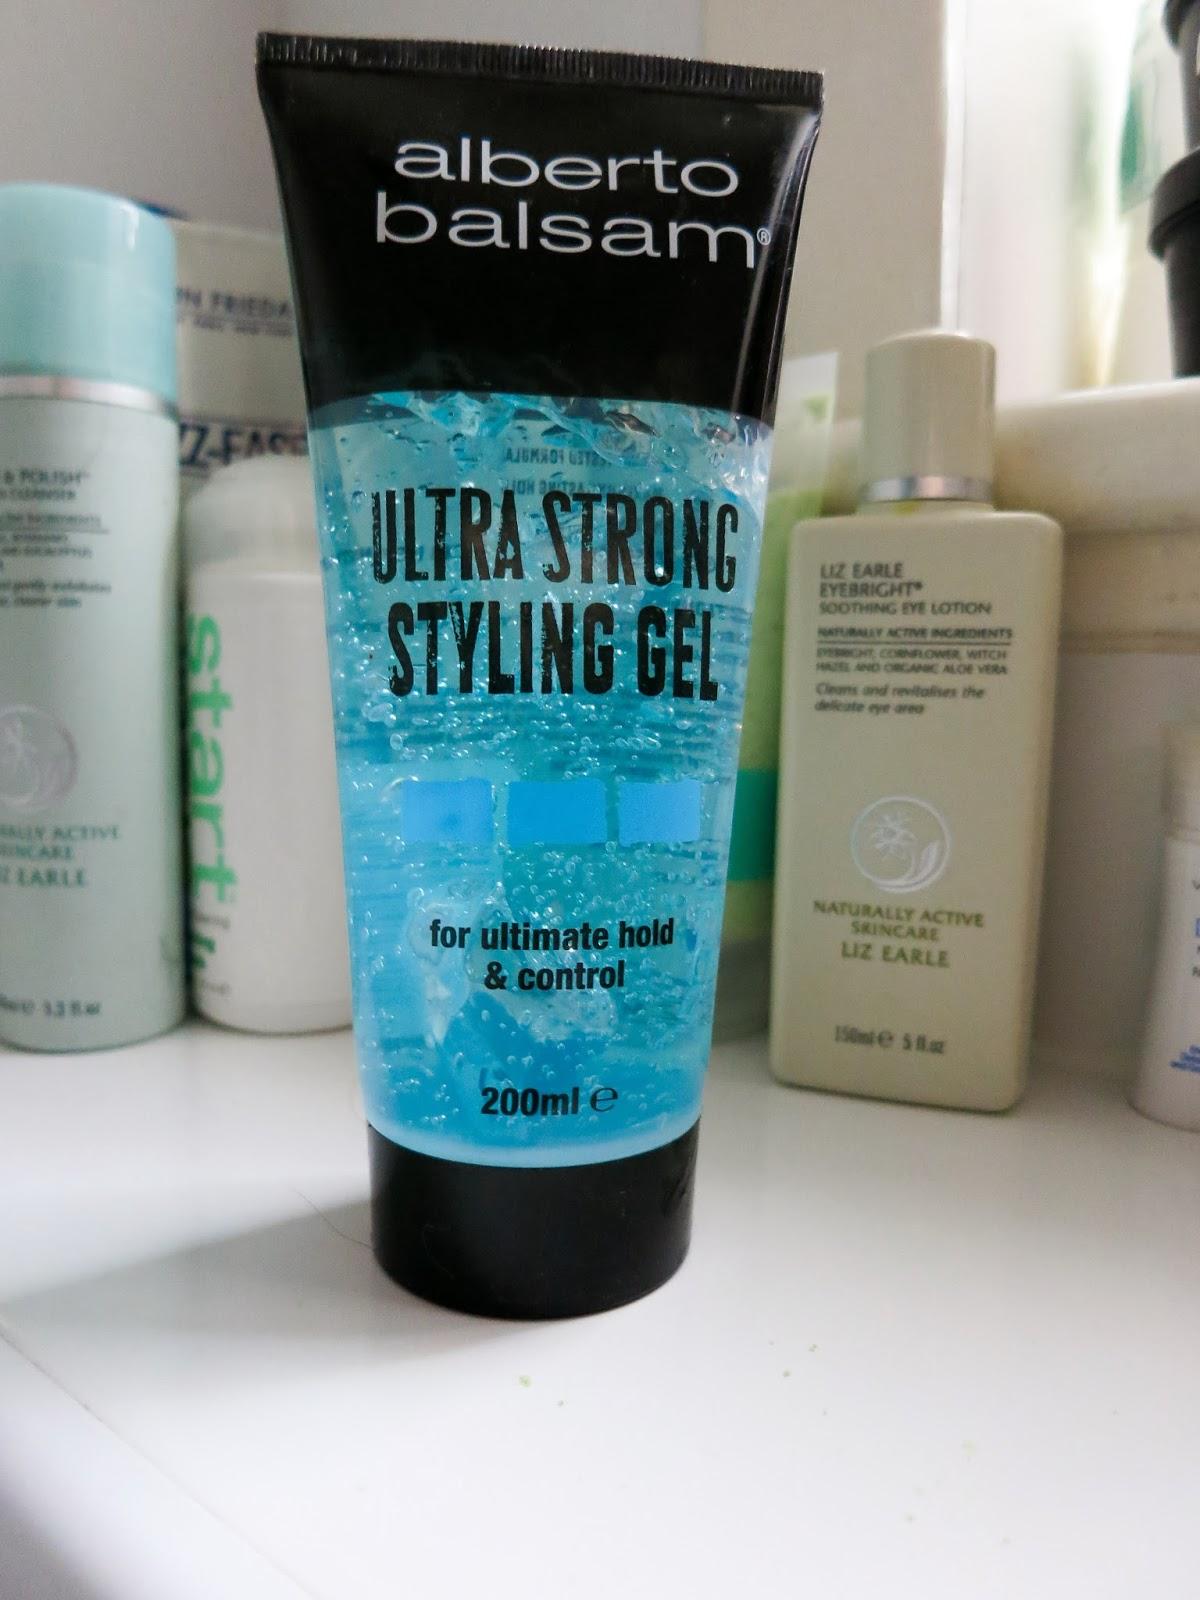 Alberto Balsam Ultra Strong Styling Gel